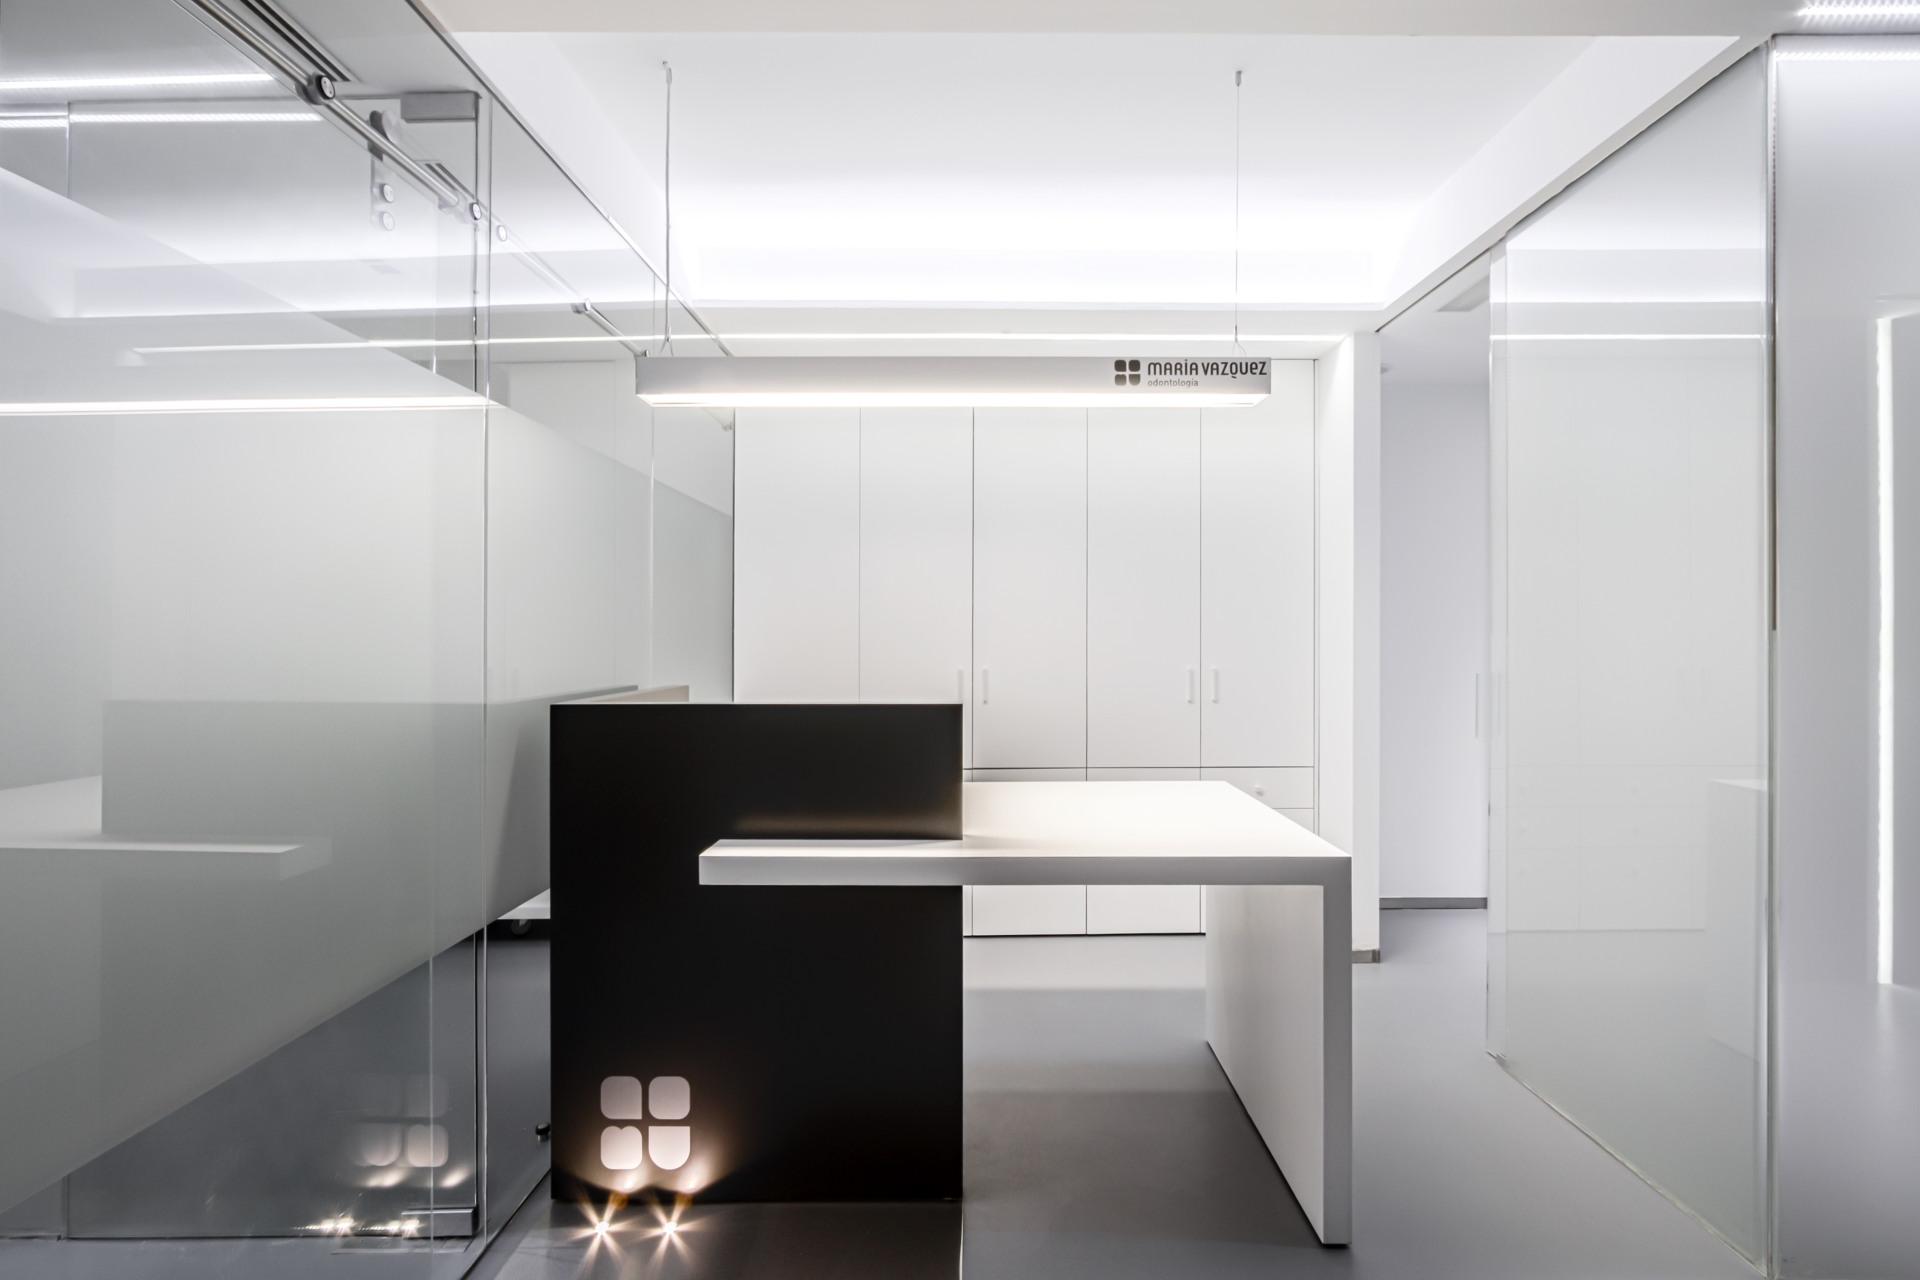 fotografia-arquitectura-valencia-german-cabo-hernandez-clinica (1)